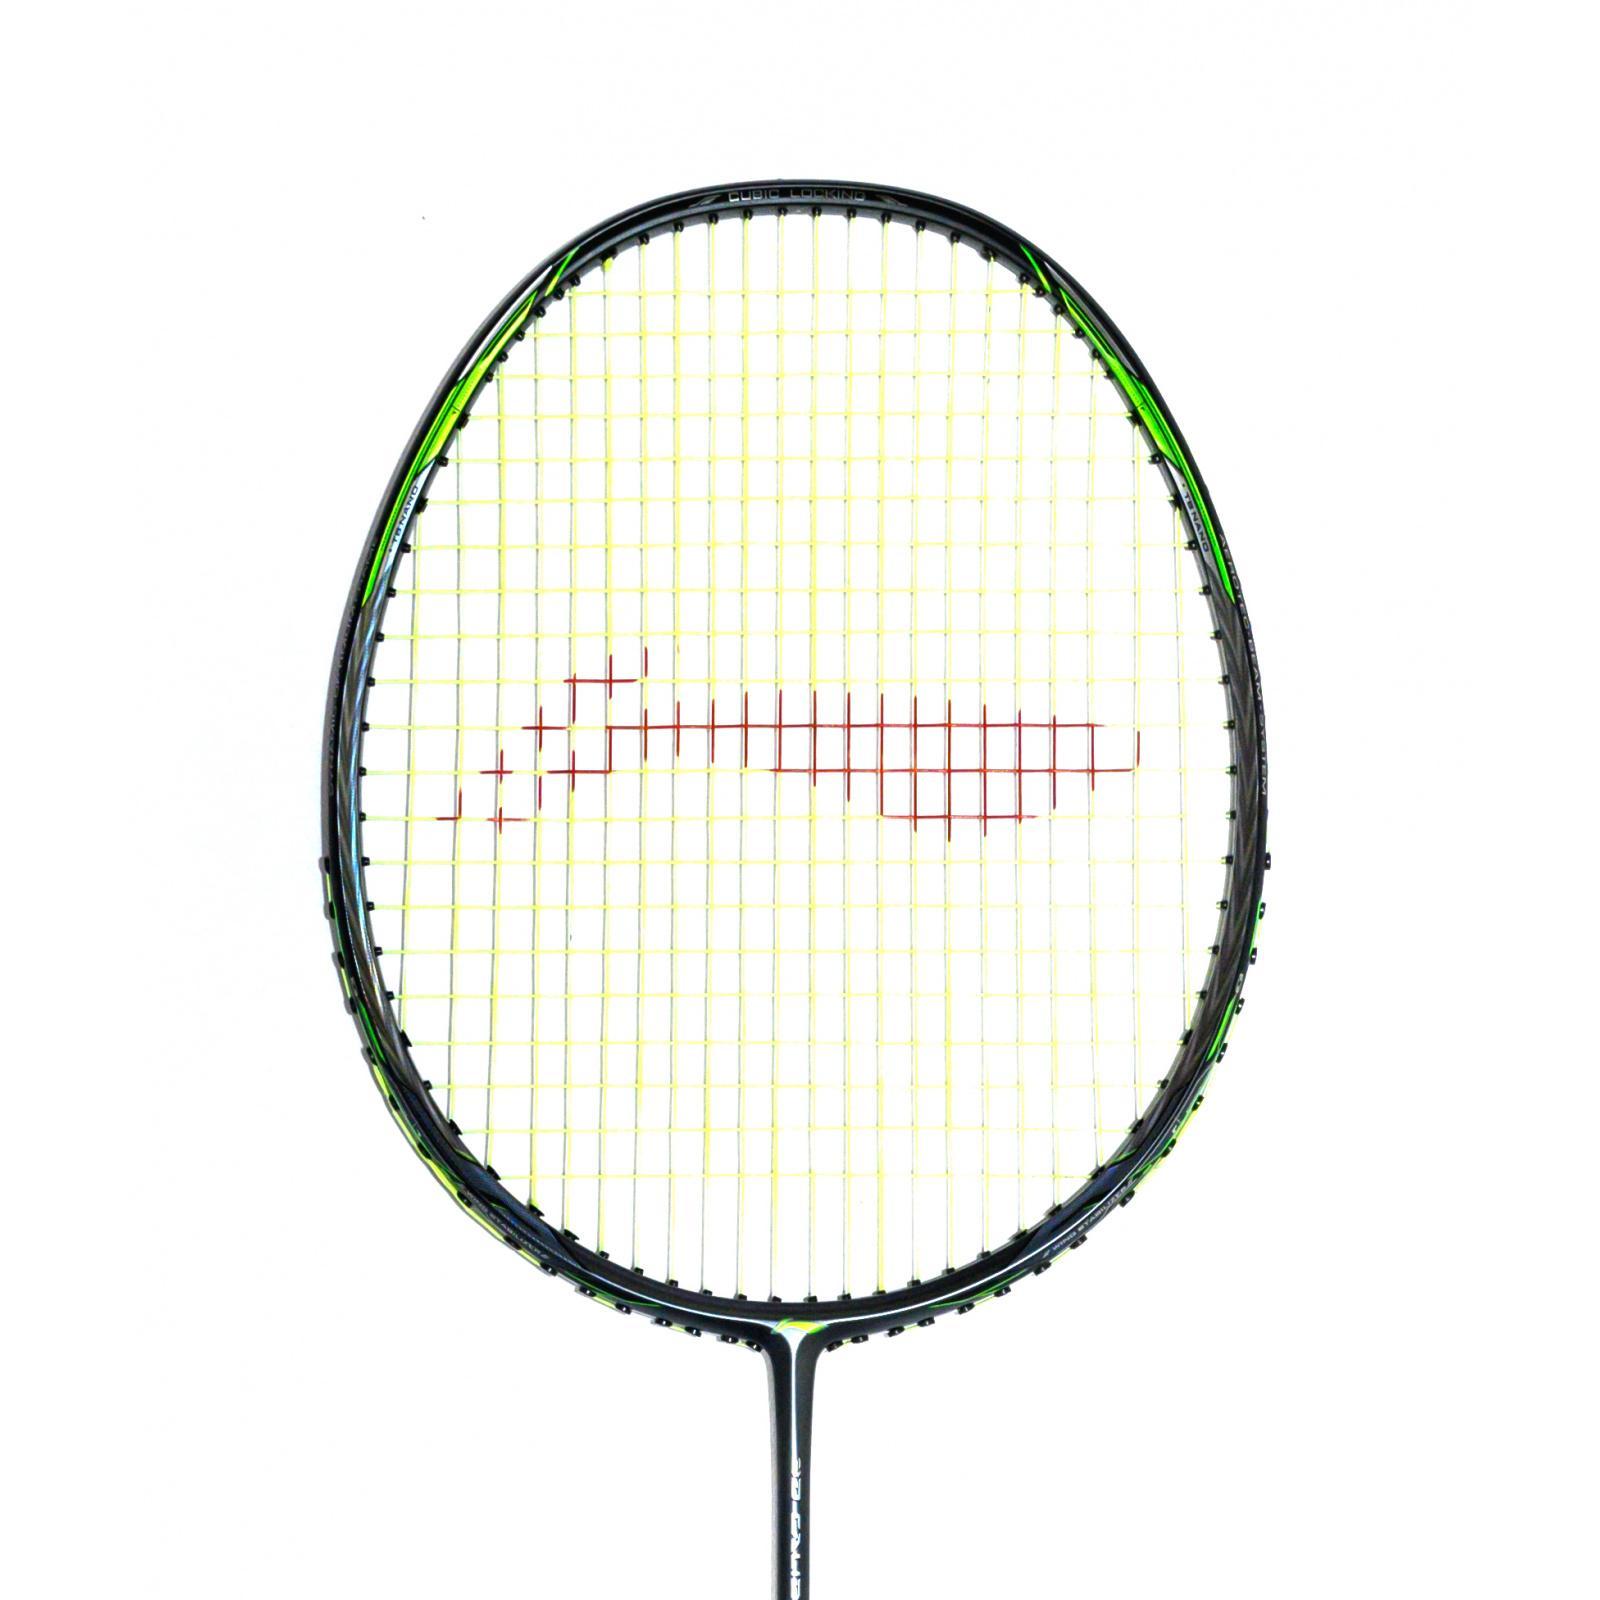 https://www.badec.store/produkty_img/badmintonova-raketa1570562932L.jpg